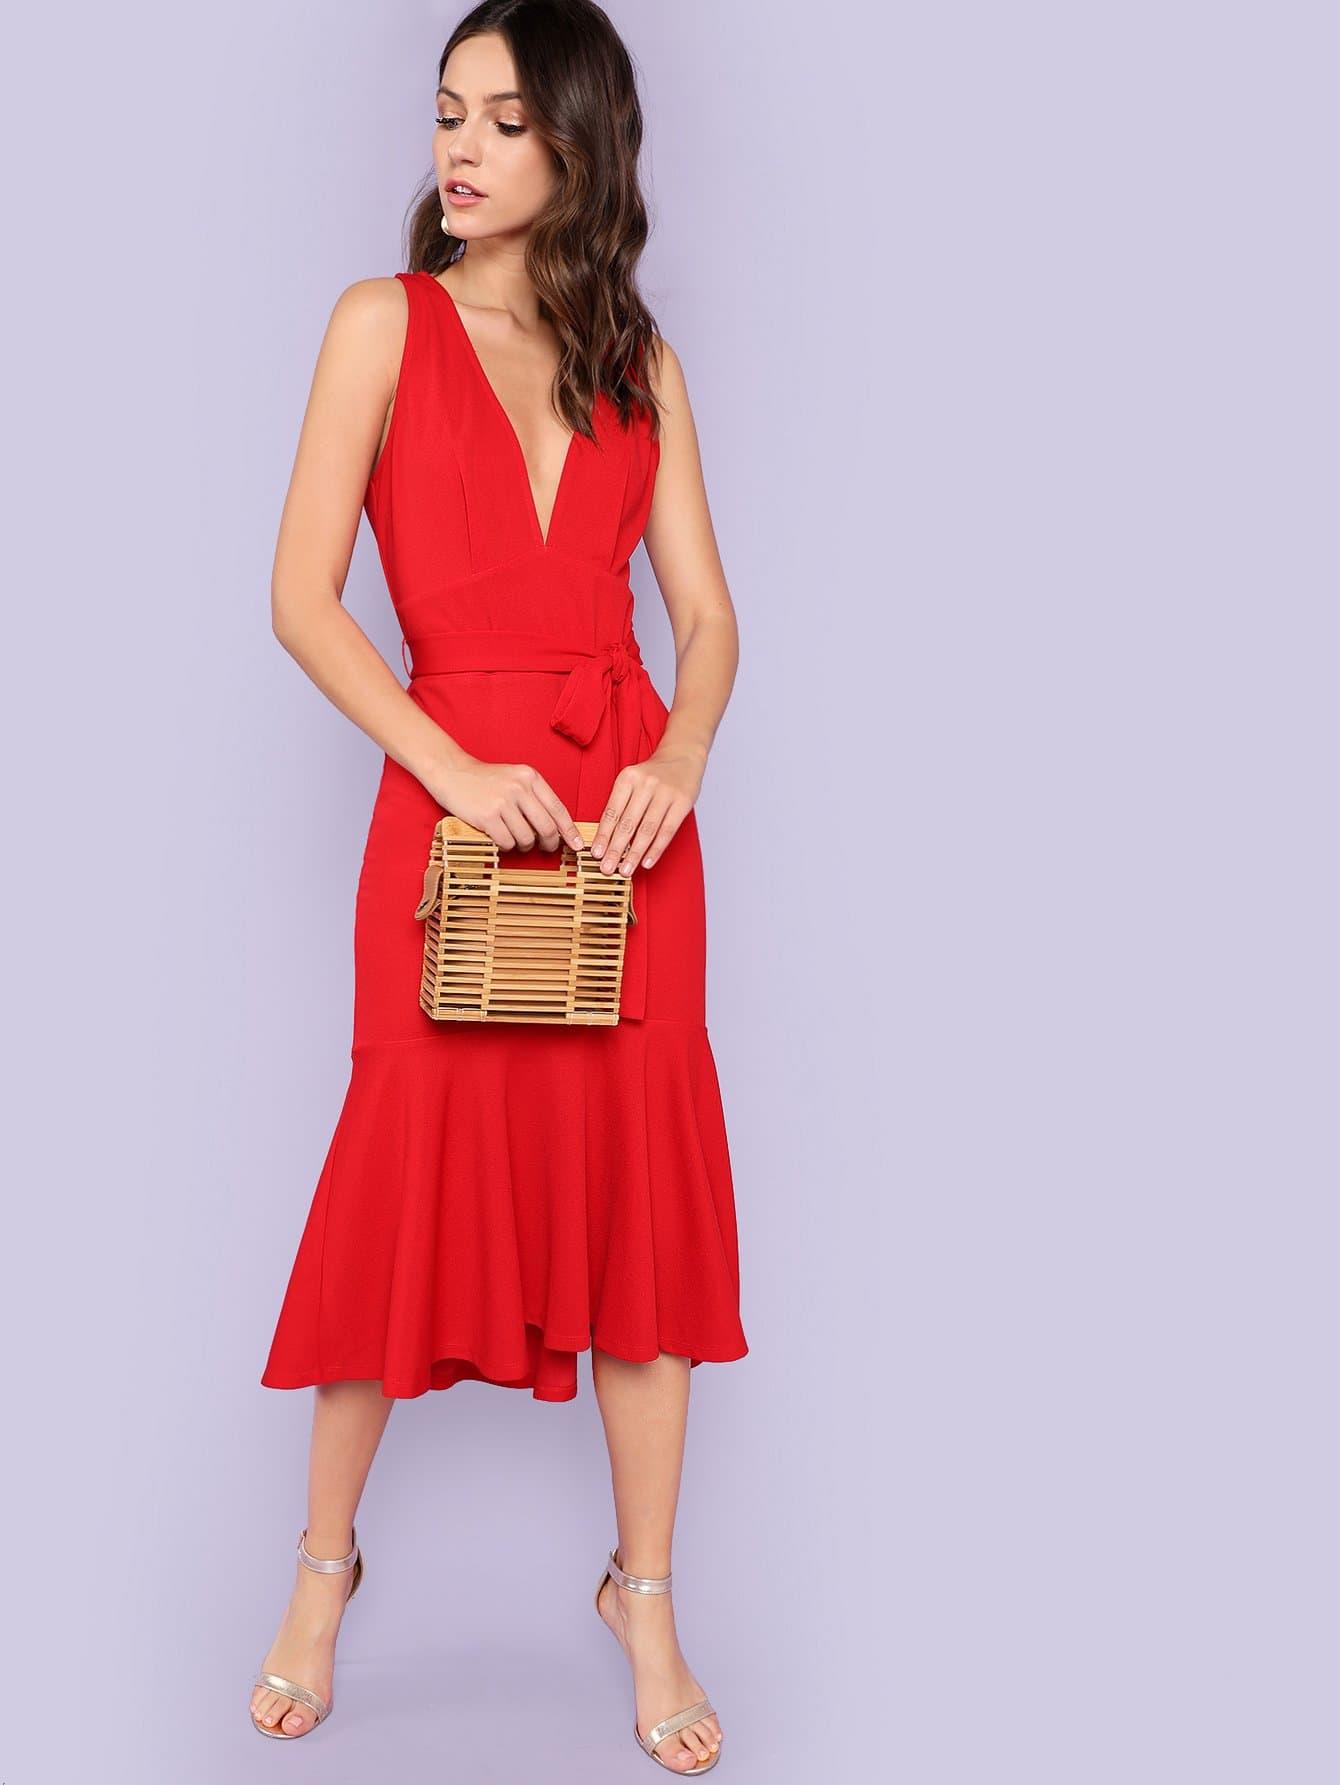 Plunging Neck Self Belted Ruffle Hem Dress mixed print plunging neck self belted dress